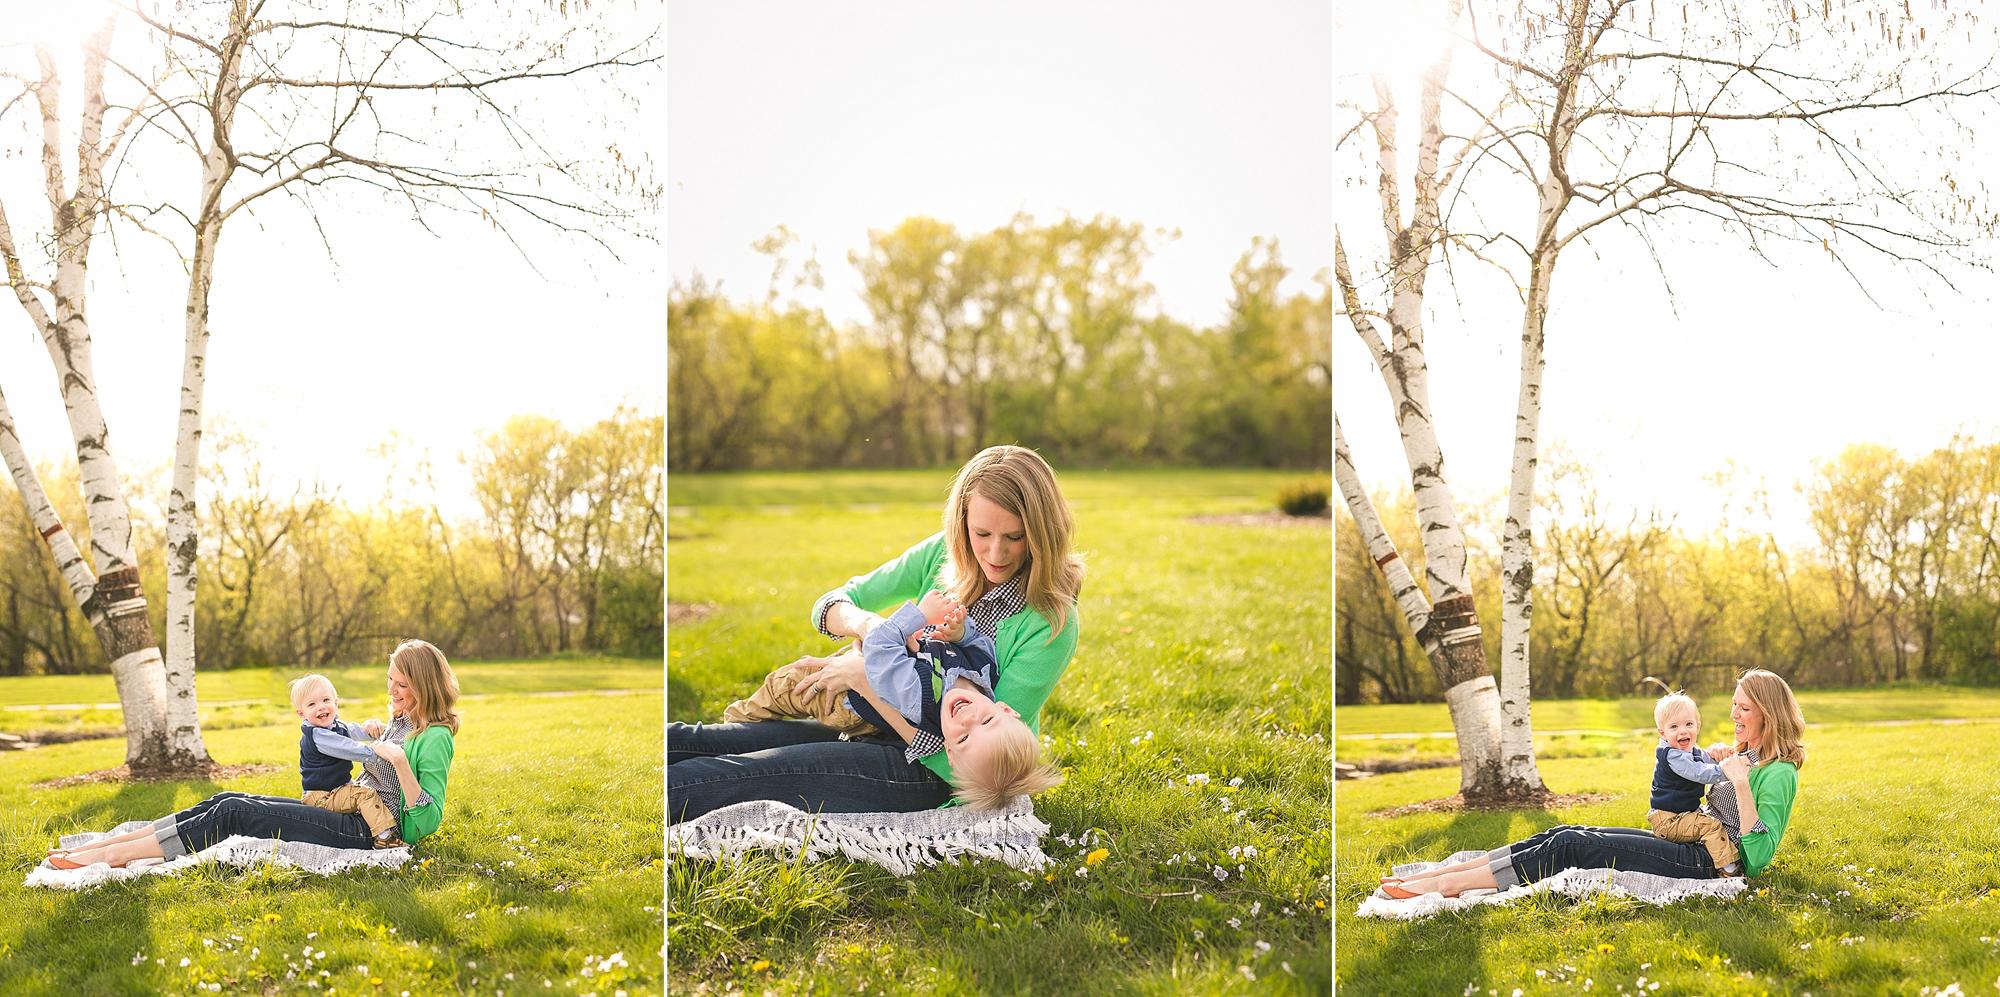 ashley vos photography seattle area lifestyle family photographer_0439.jpg